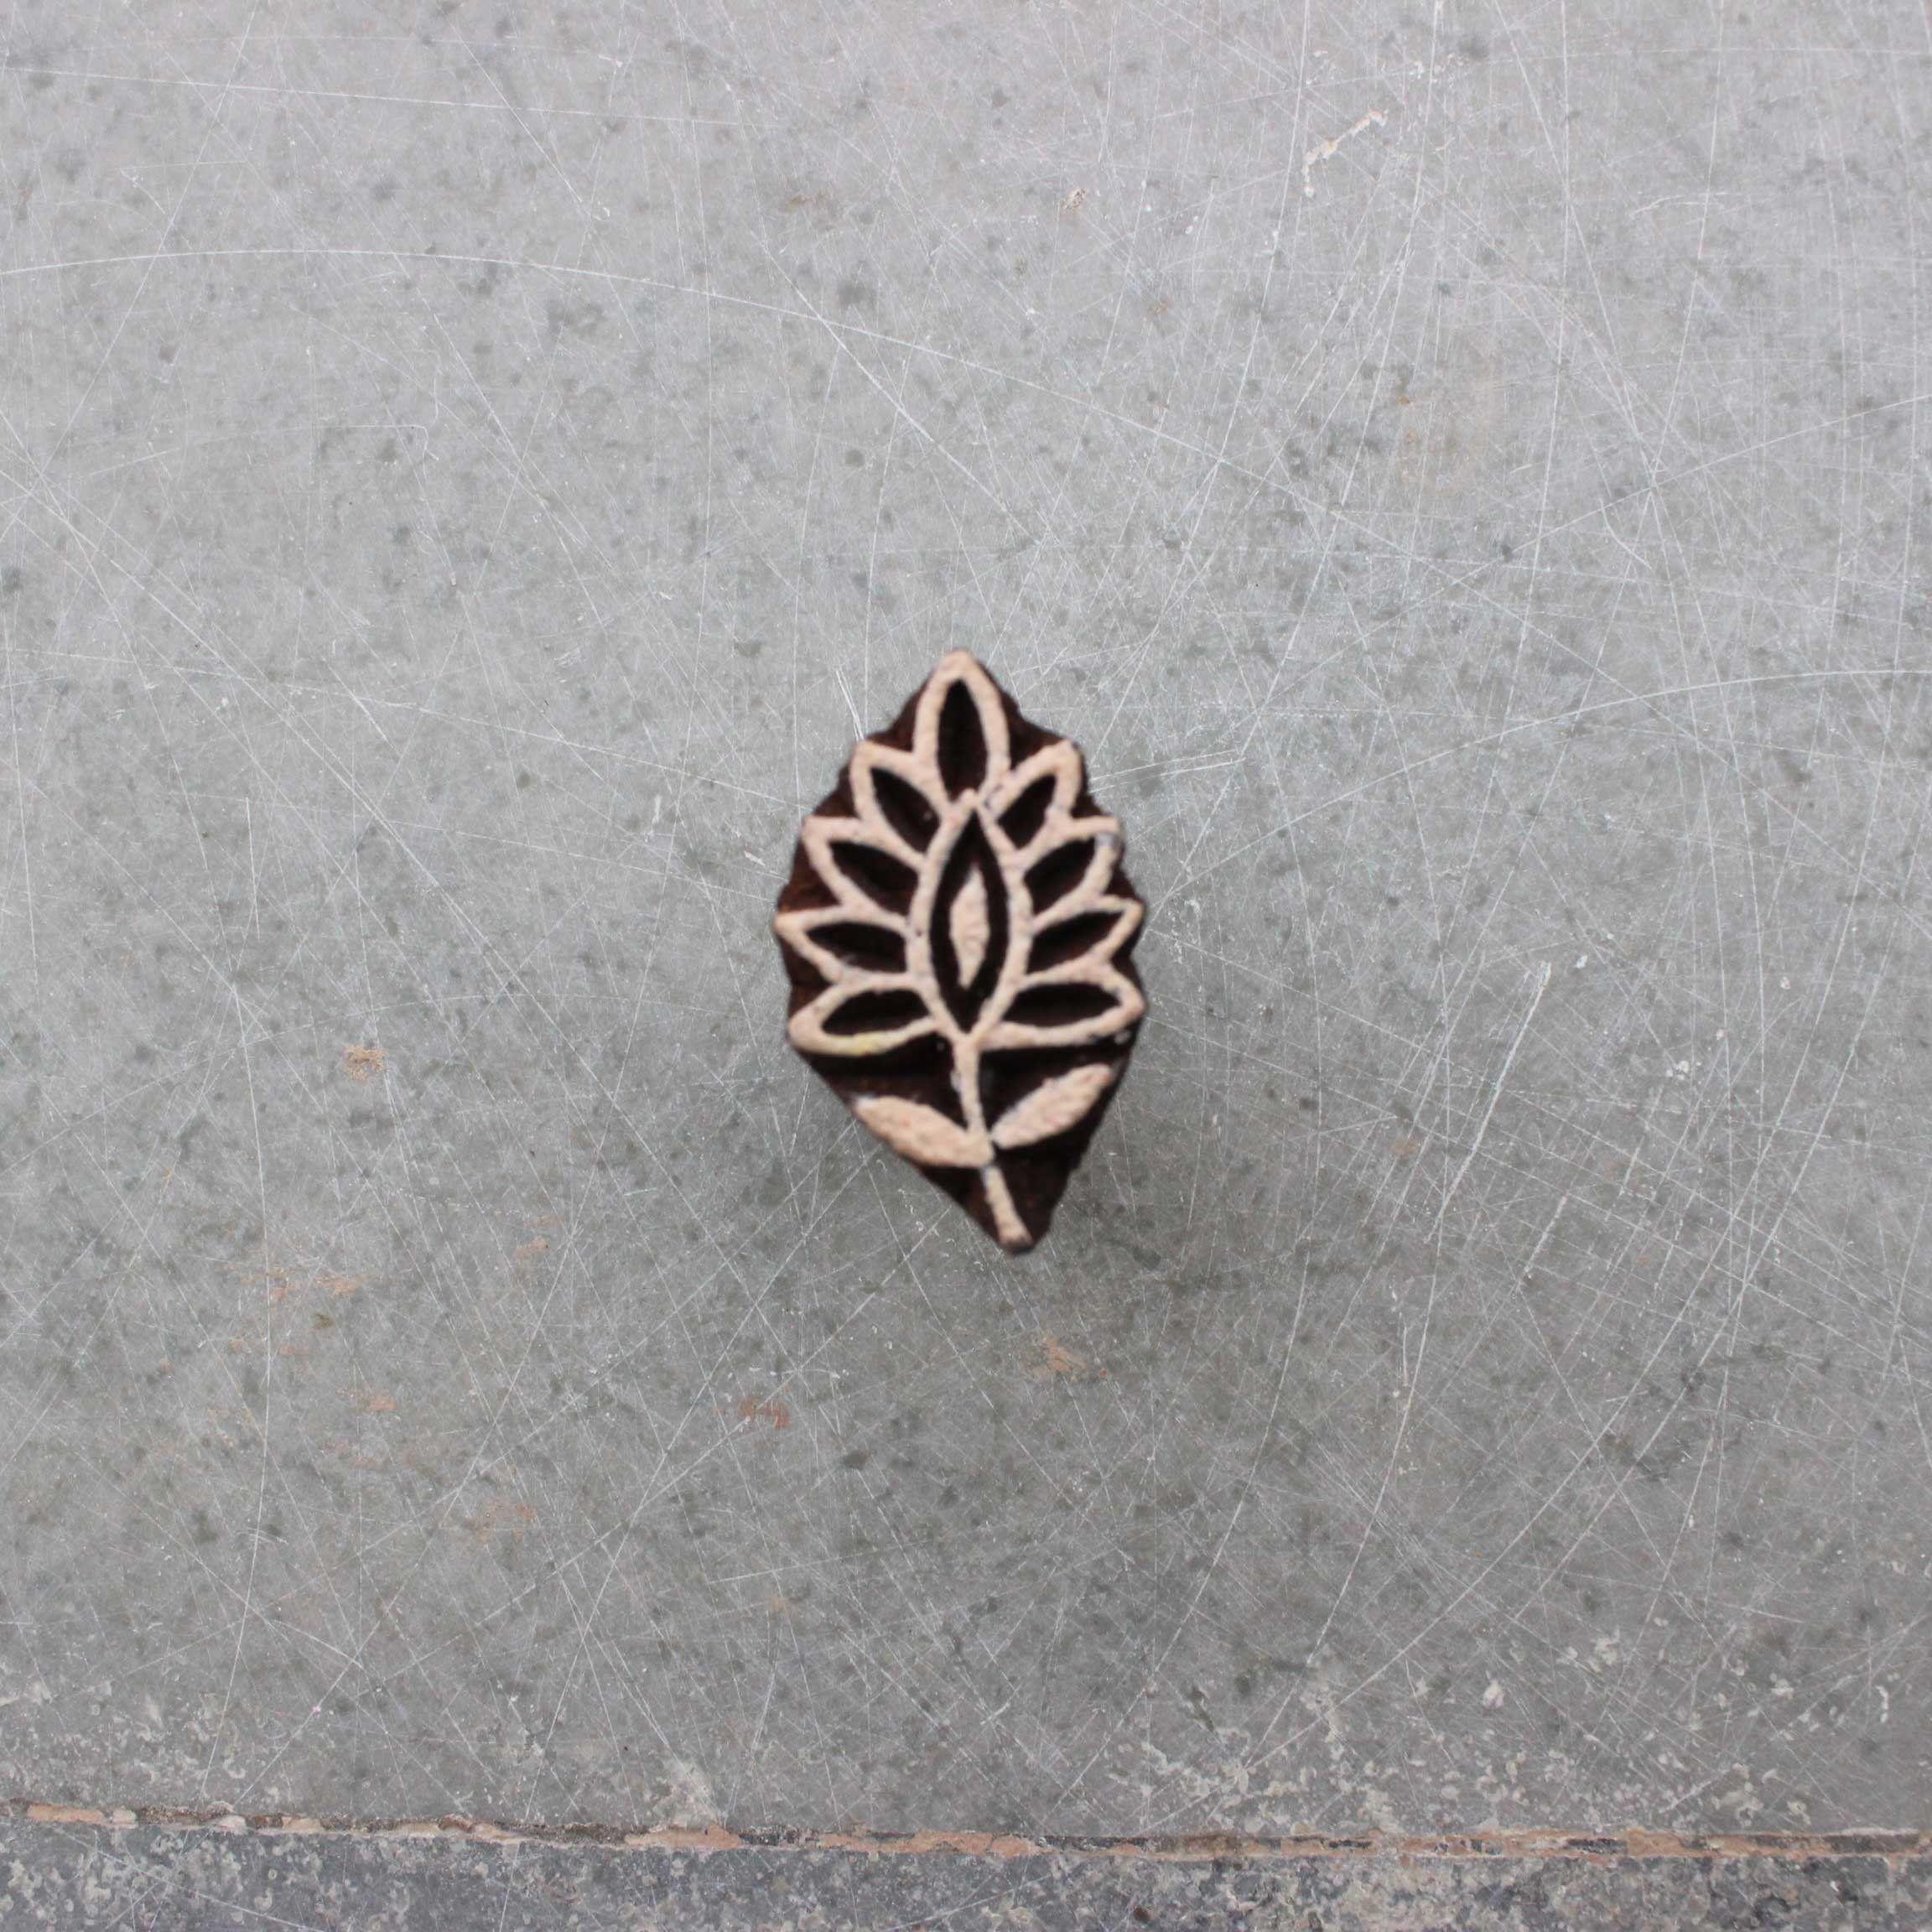 Giraffe Block Print Stamp Carve Block Fabric Stamp Animal Fabric Stamp Indian Textile Block For Printing Kids Craft Soap Stamp Kids Party